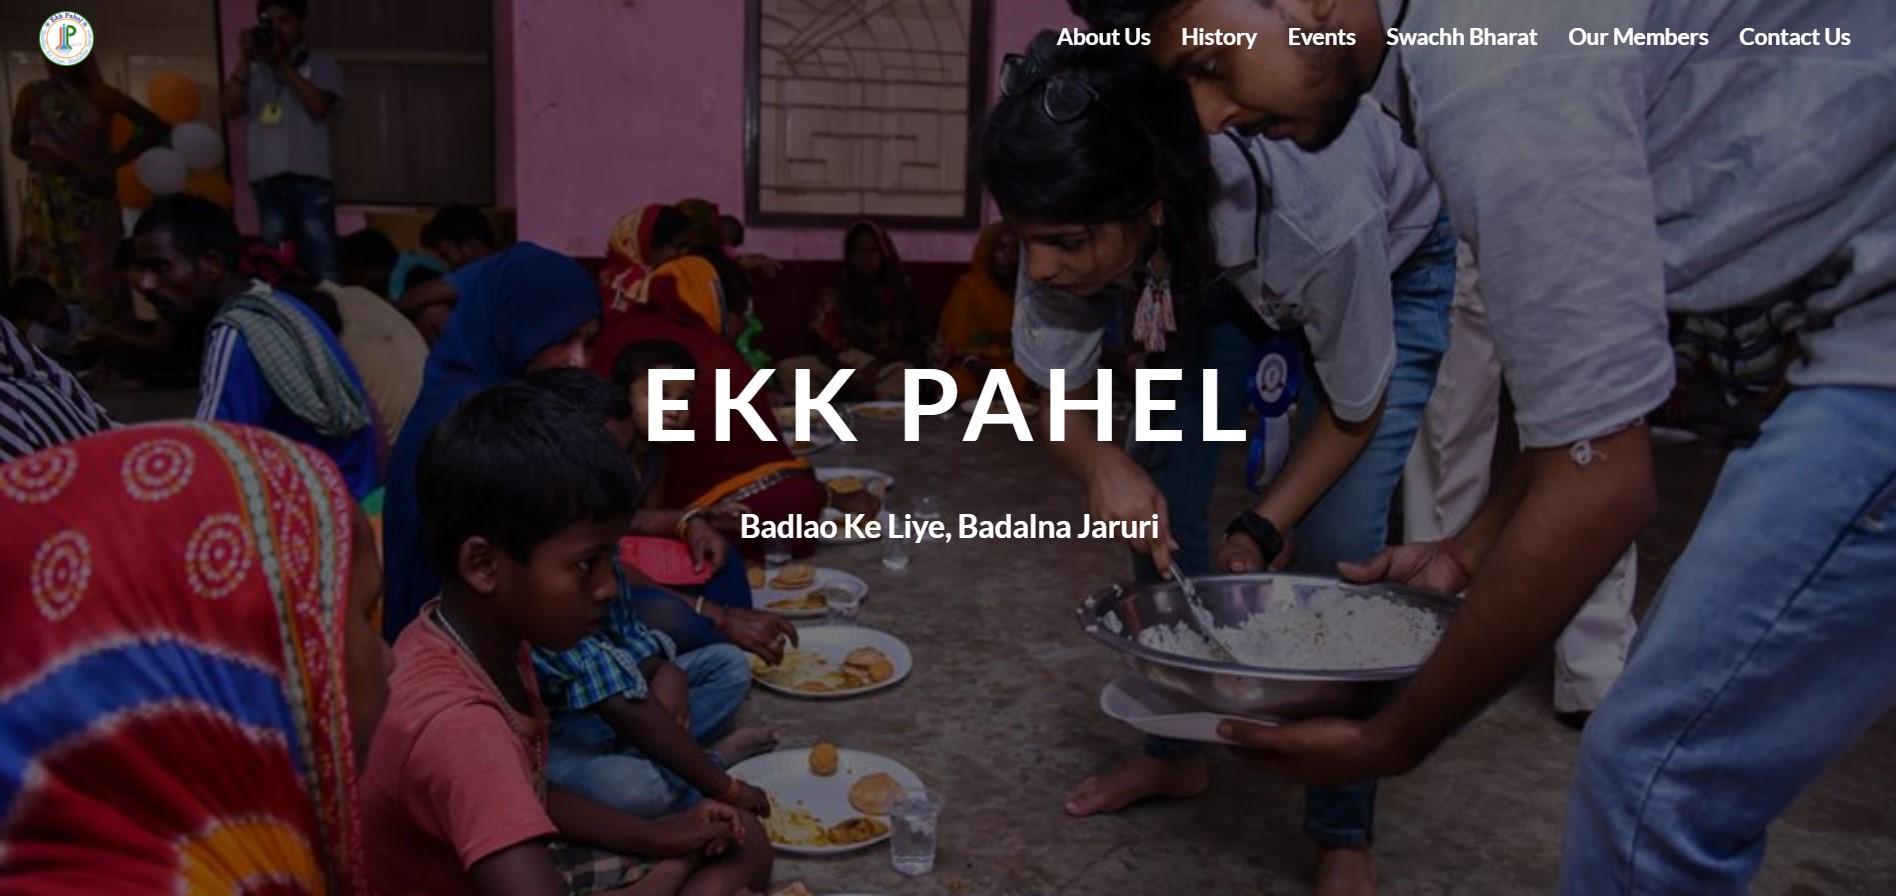 ekkpahel.com